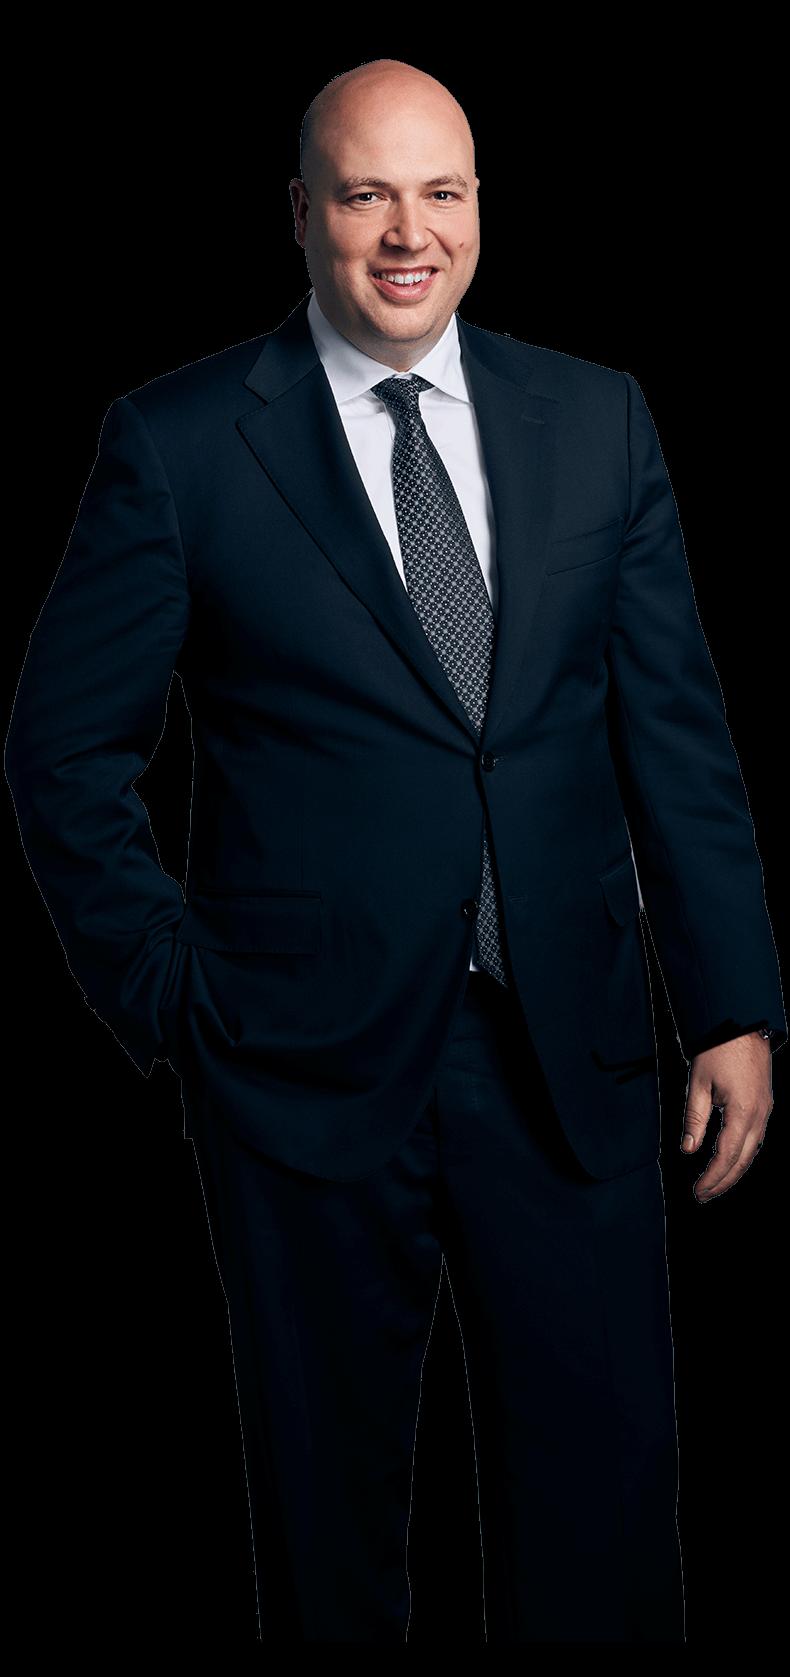 Patrick Grosjean